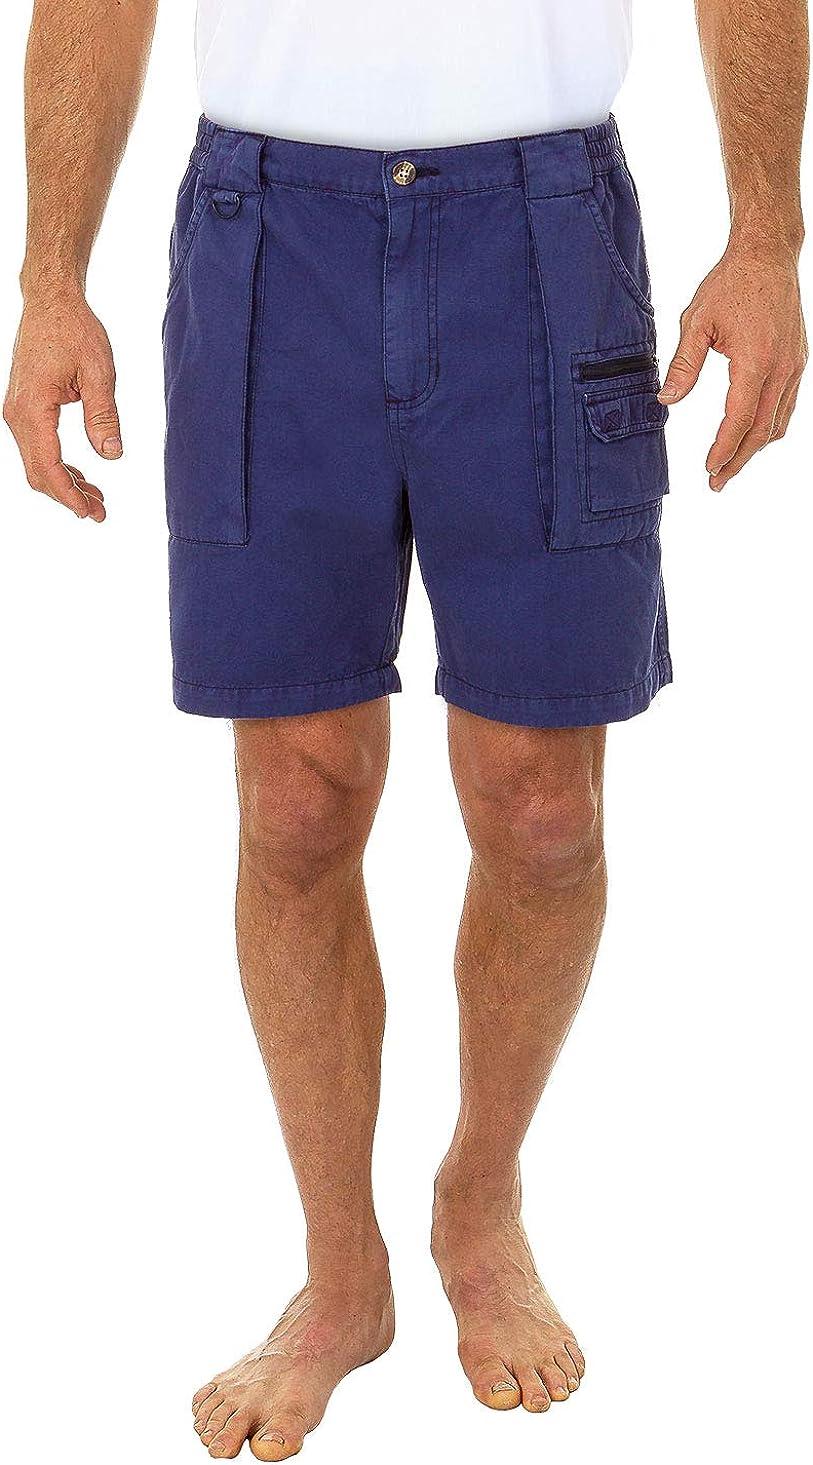 Beach Outfitters Men's Walking Hiker 100% Cotton Cargo Short, 6.5